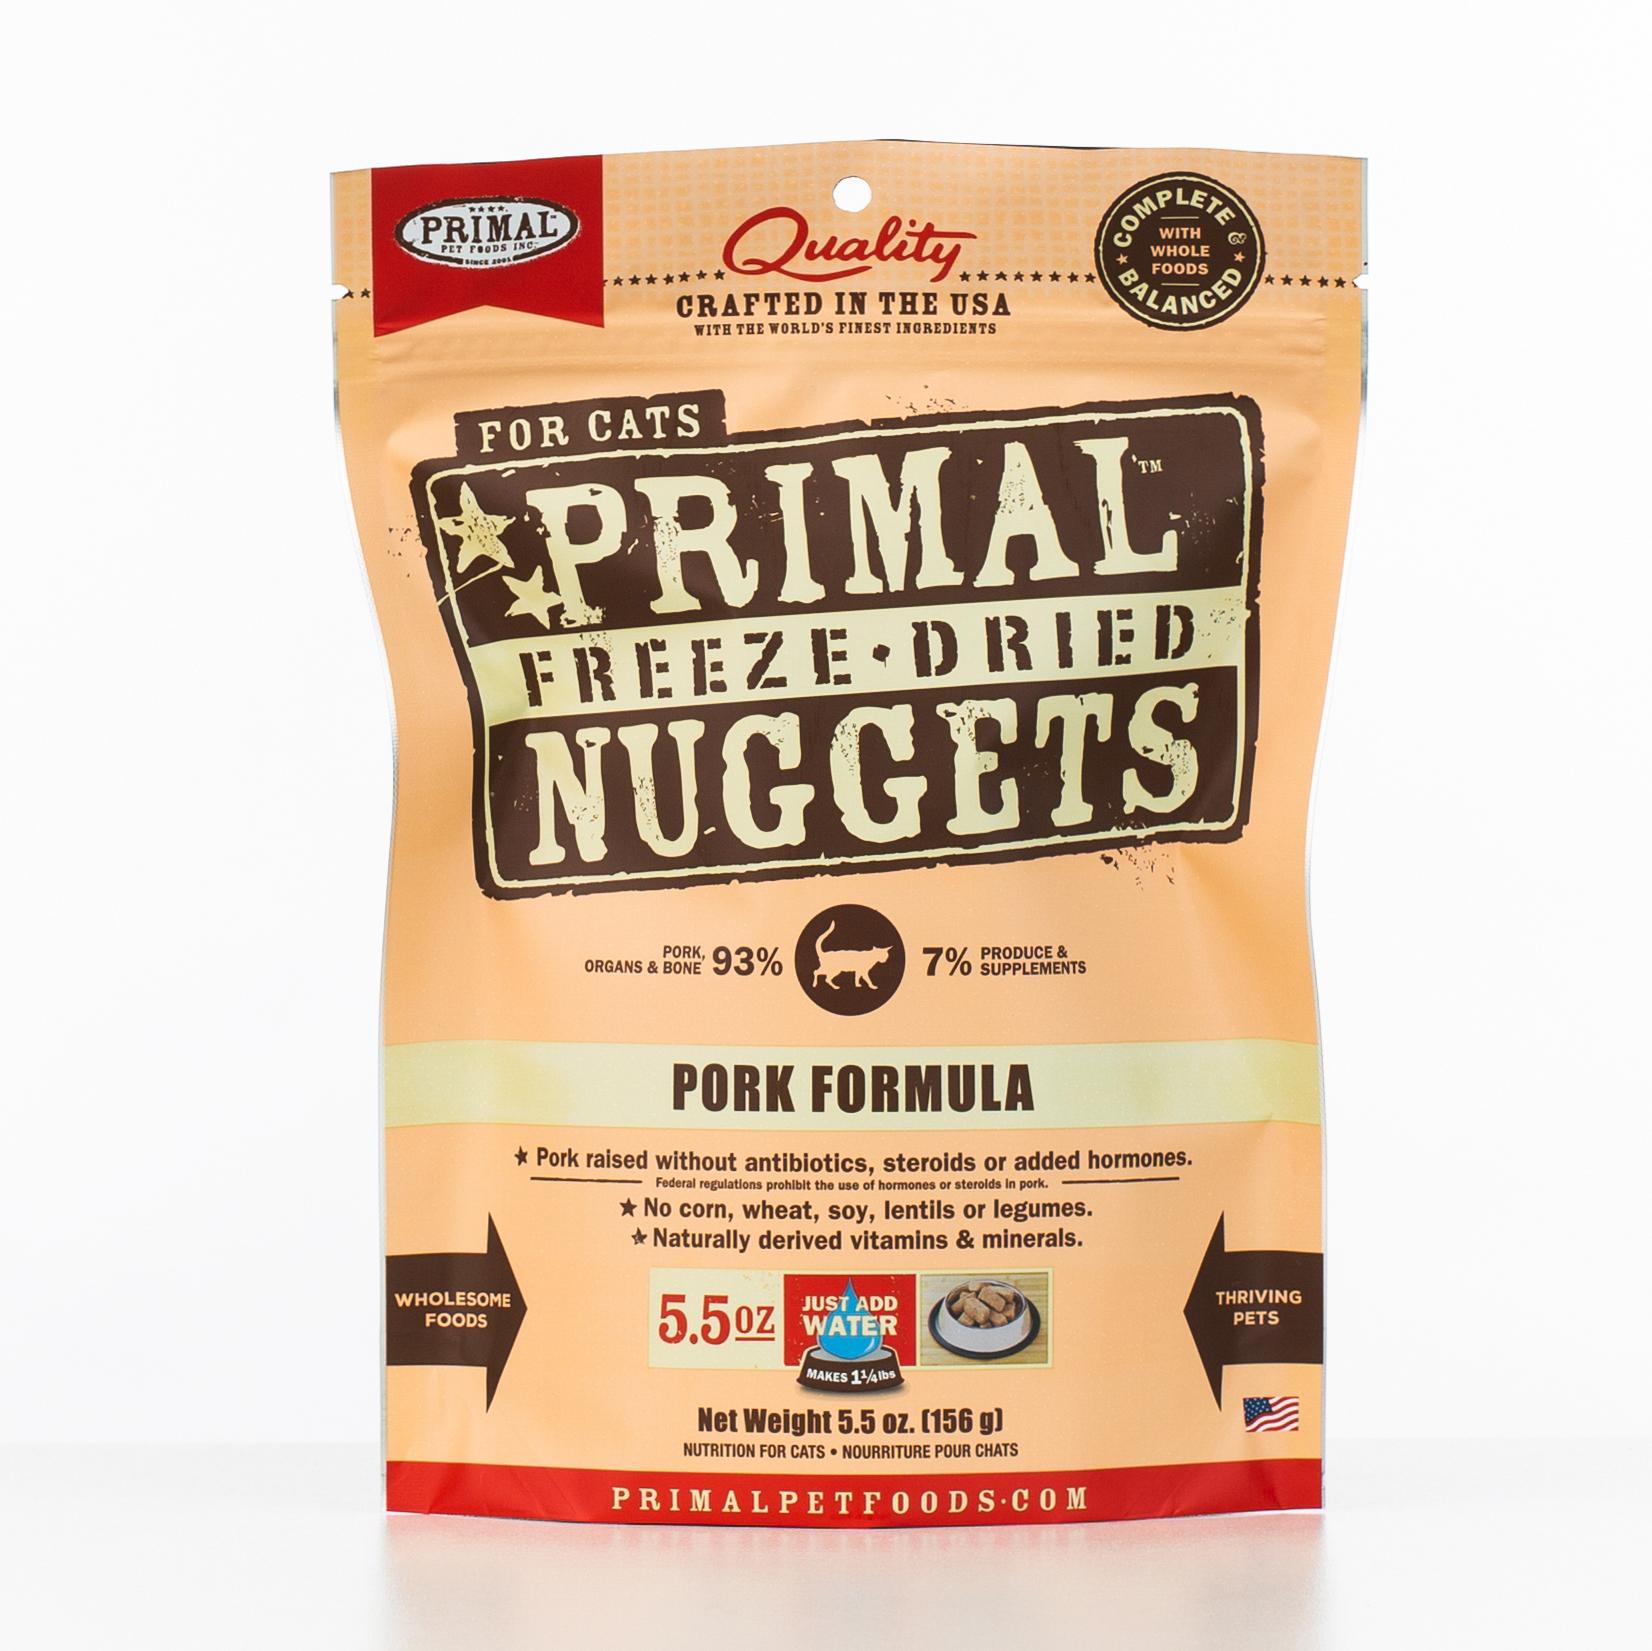 Primal Raw Freeze-Dried Nuggets Pork Formula Cat Food, 5.5-oz bag